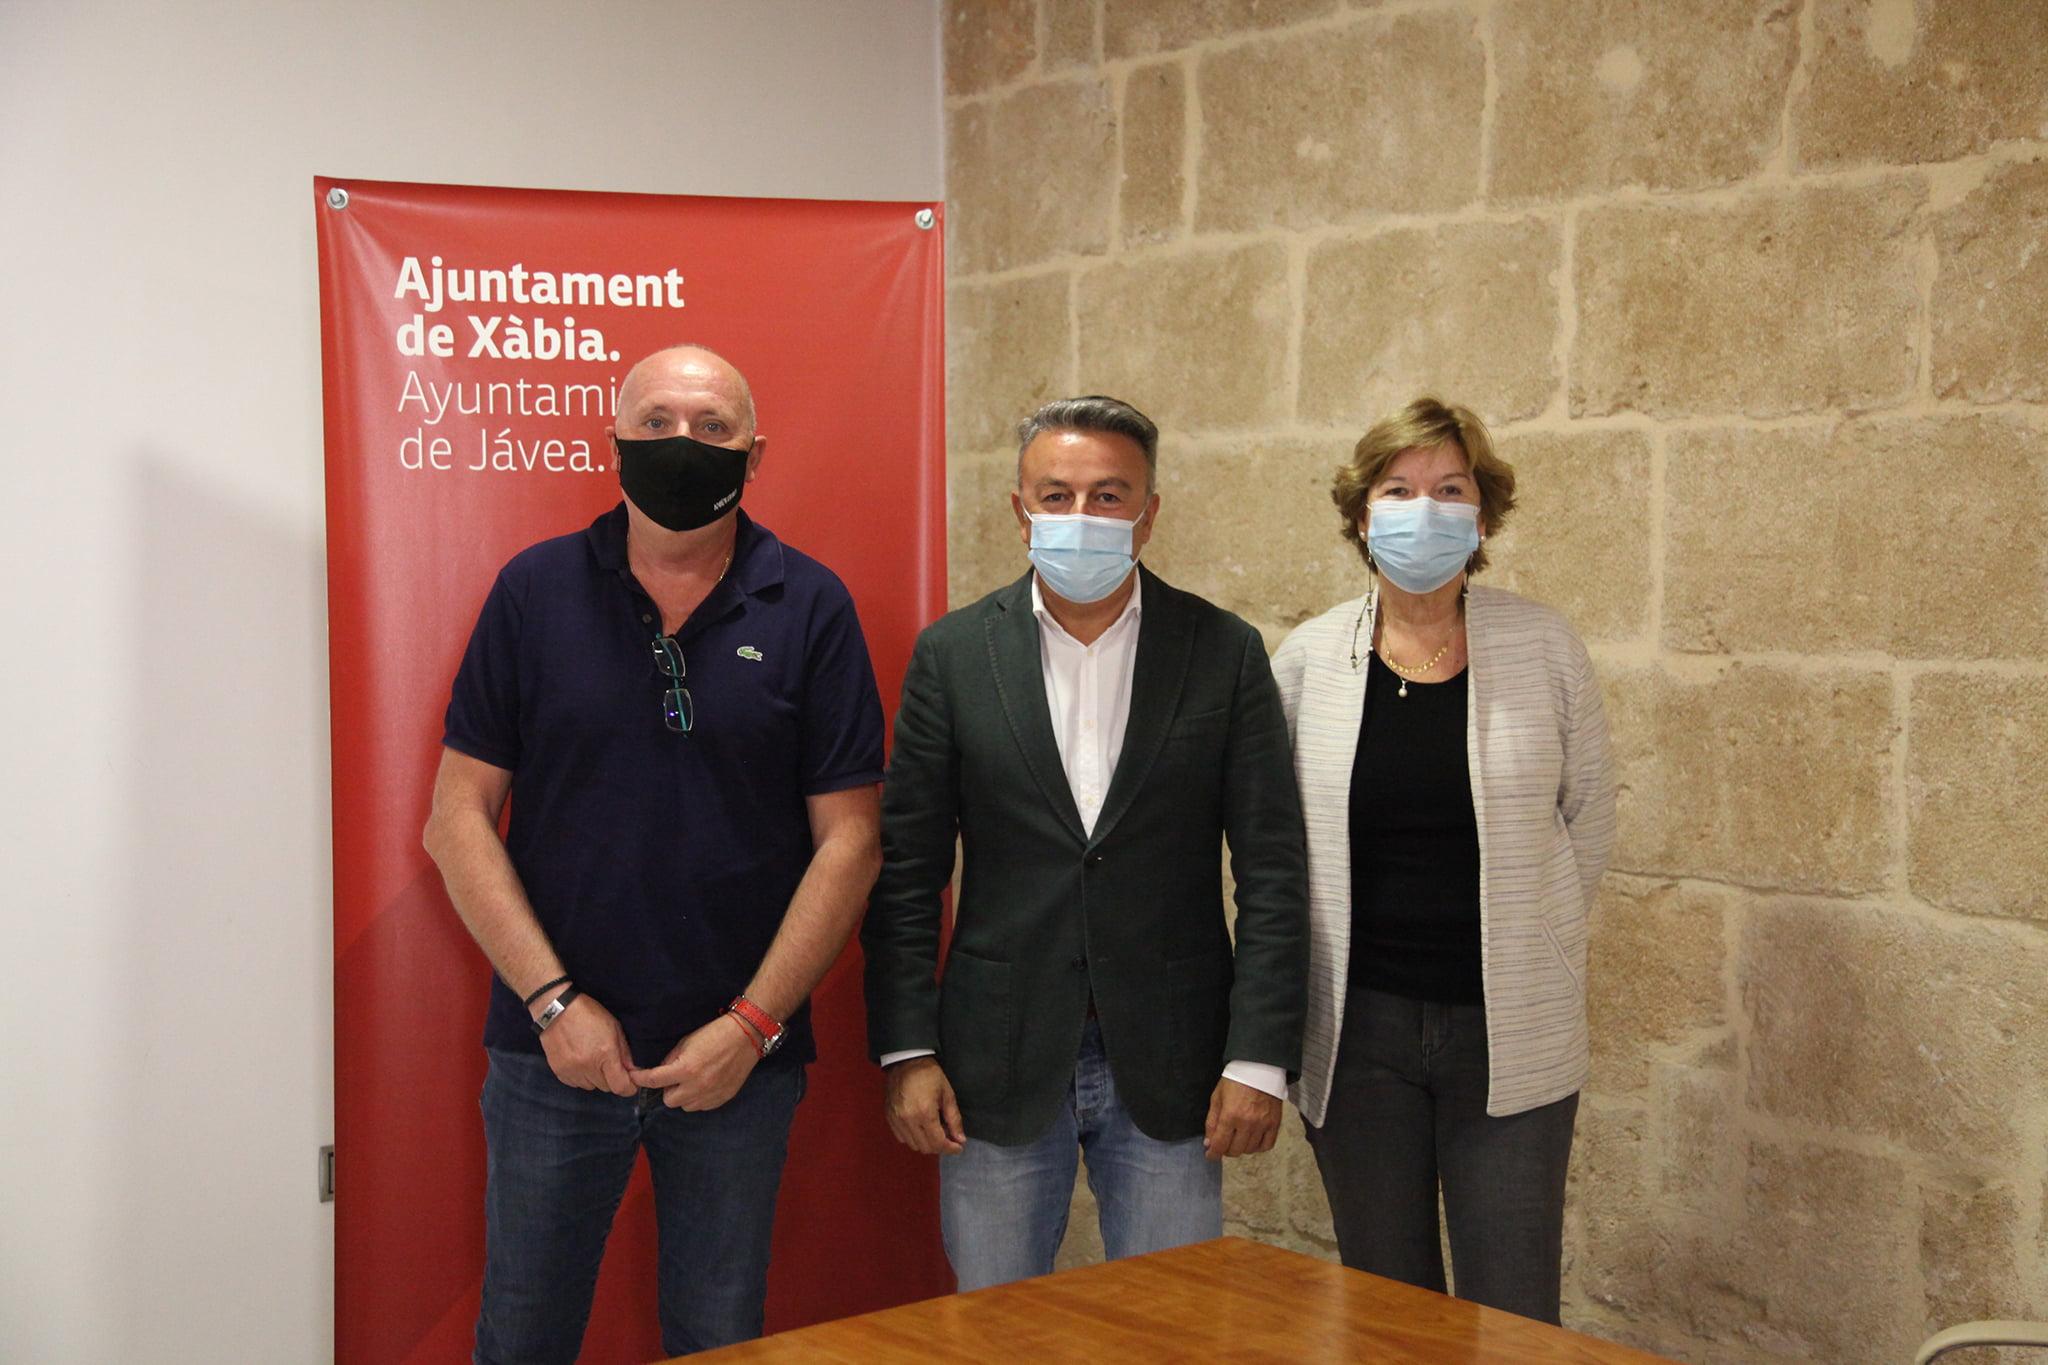 Juan Ortolà, José Chulvi y Isabel Bolufer